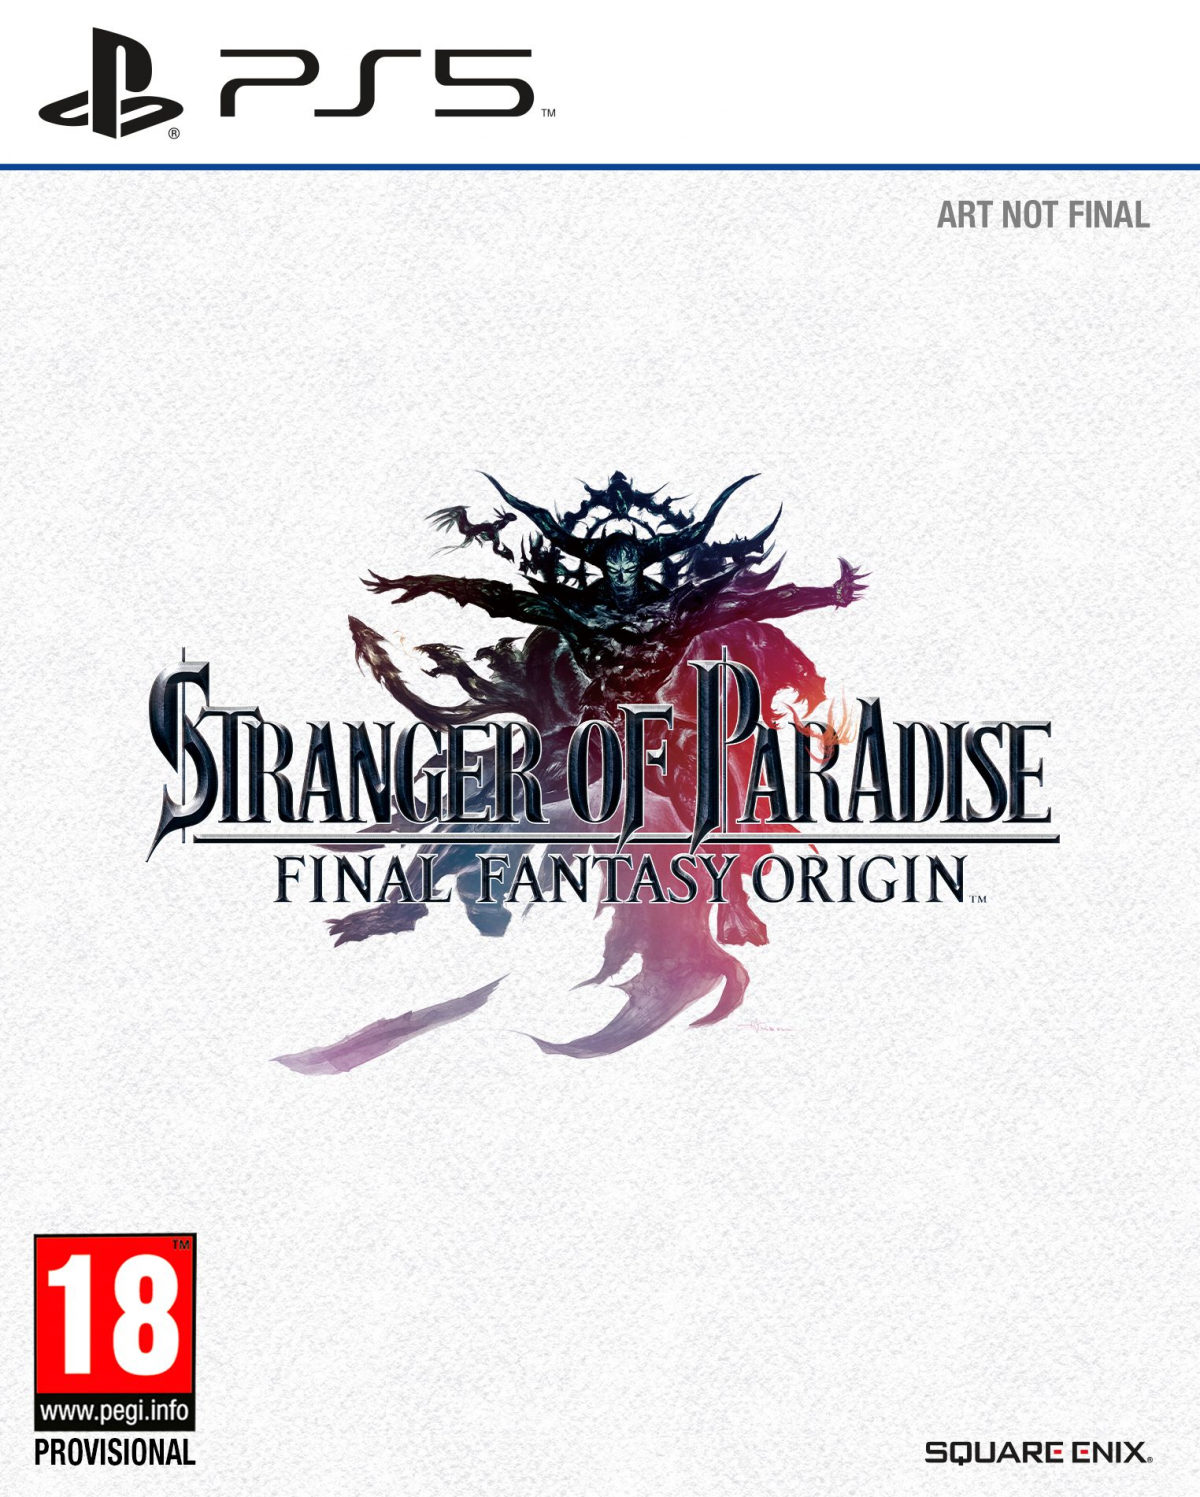 PS5 Stranger of Paradise Final Fantasy Origin